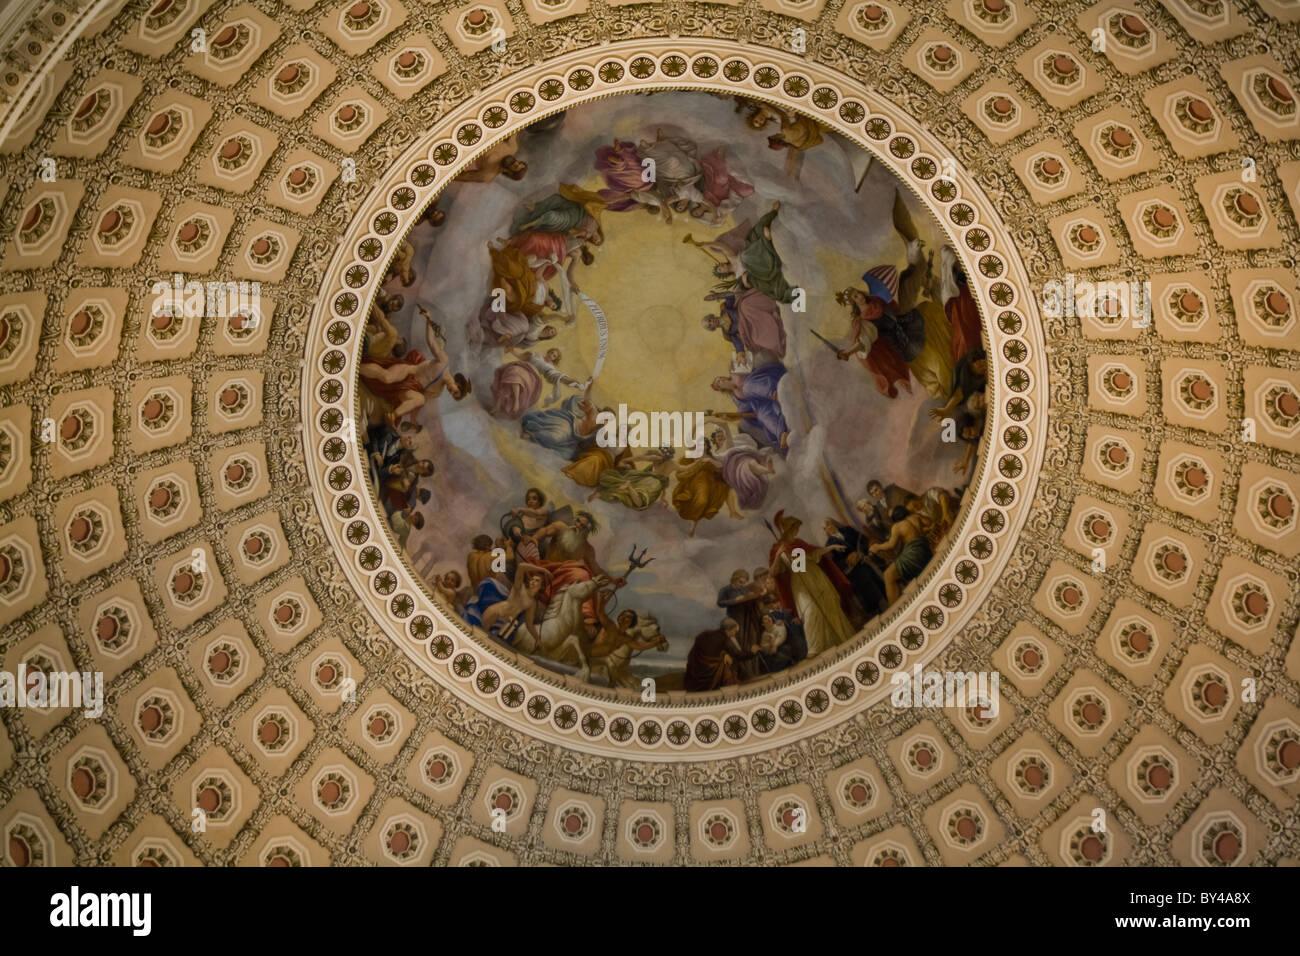 Beautiful dome of the Rotunda in the U. S. Capitol building in Washington, D. C. depicting George Washington. - Stock Image